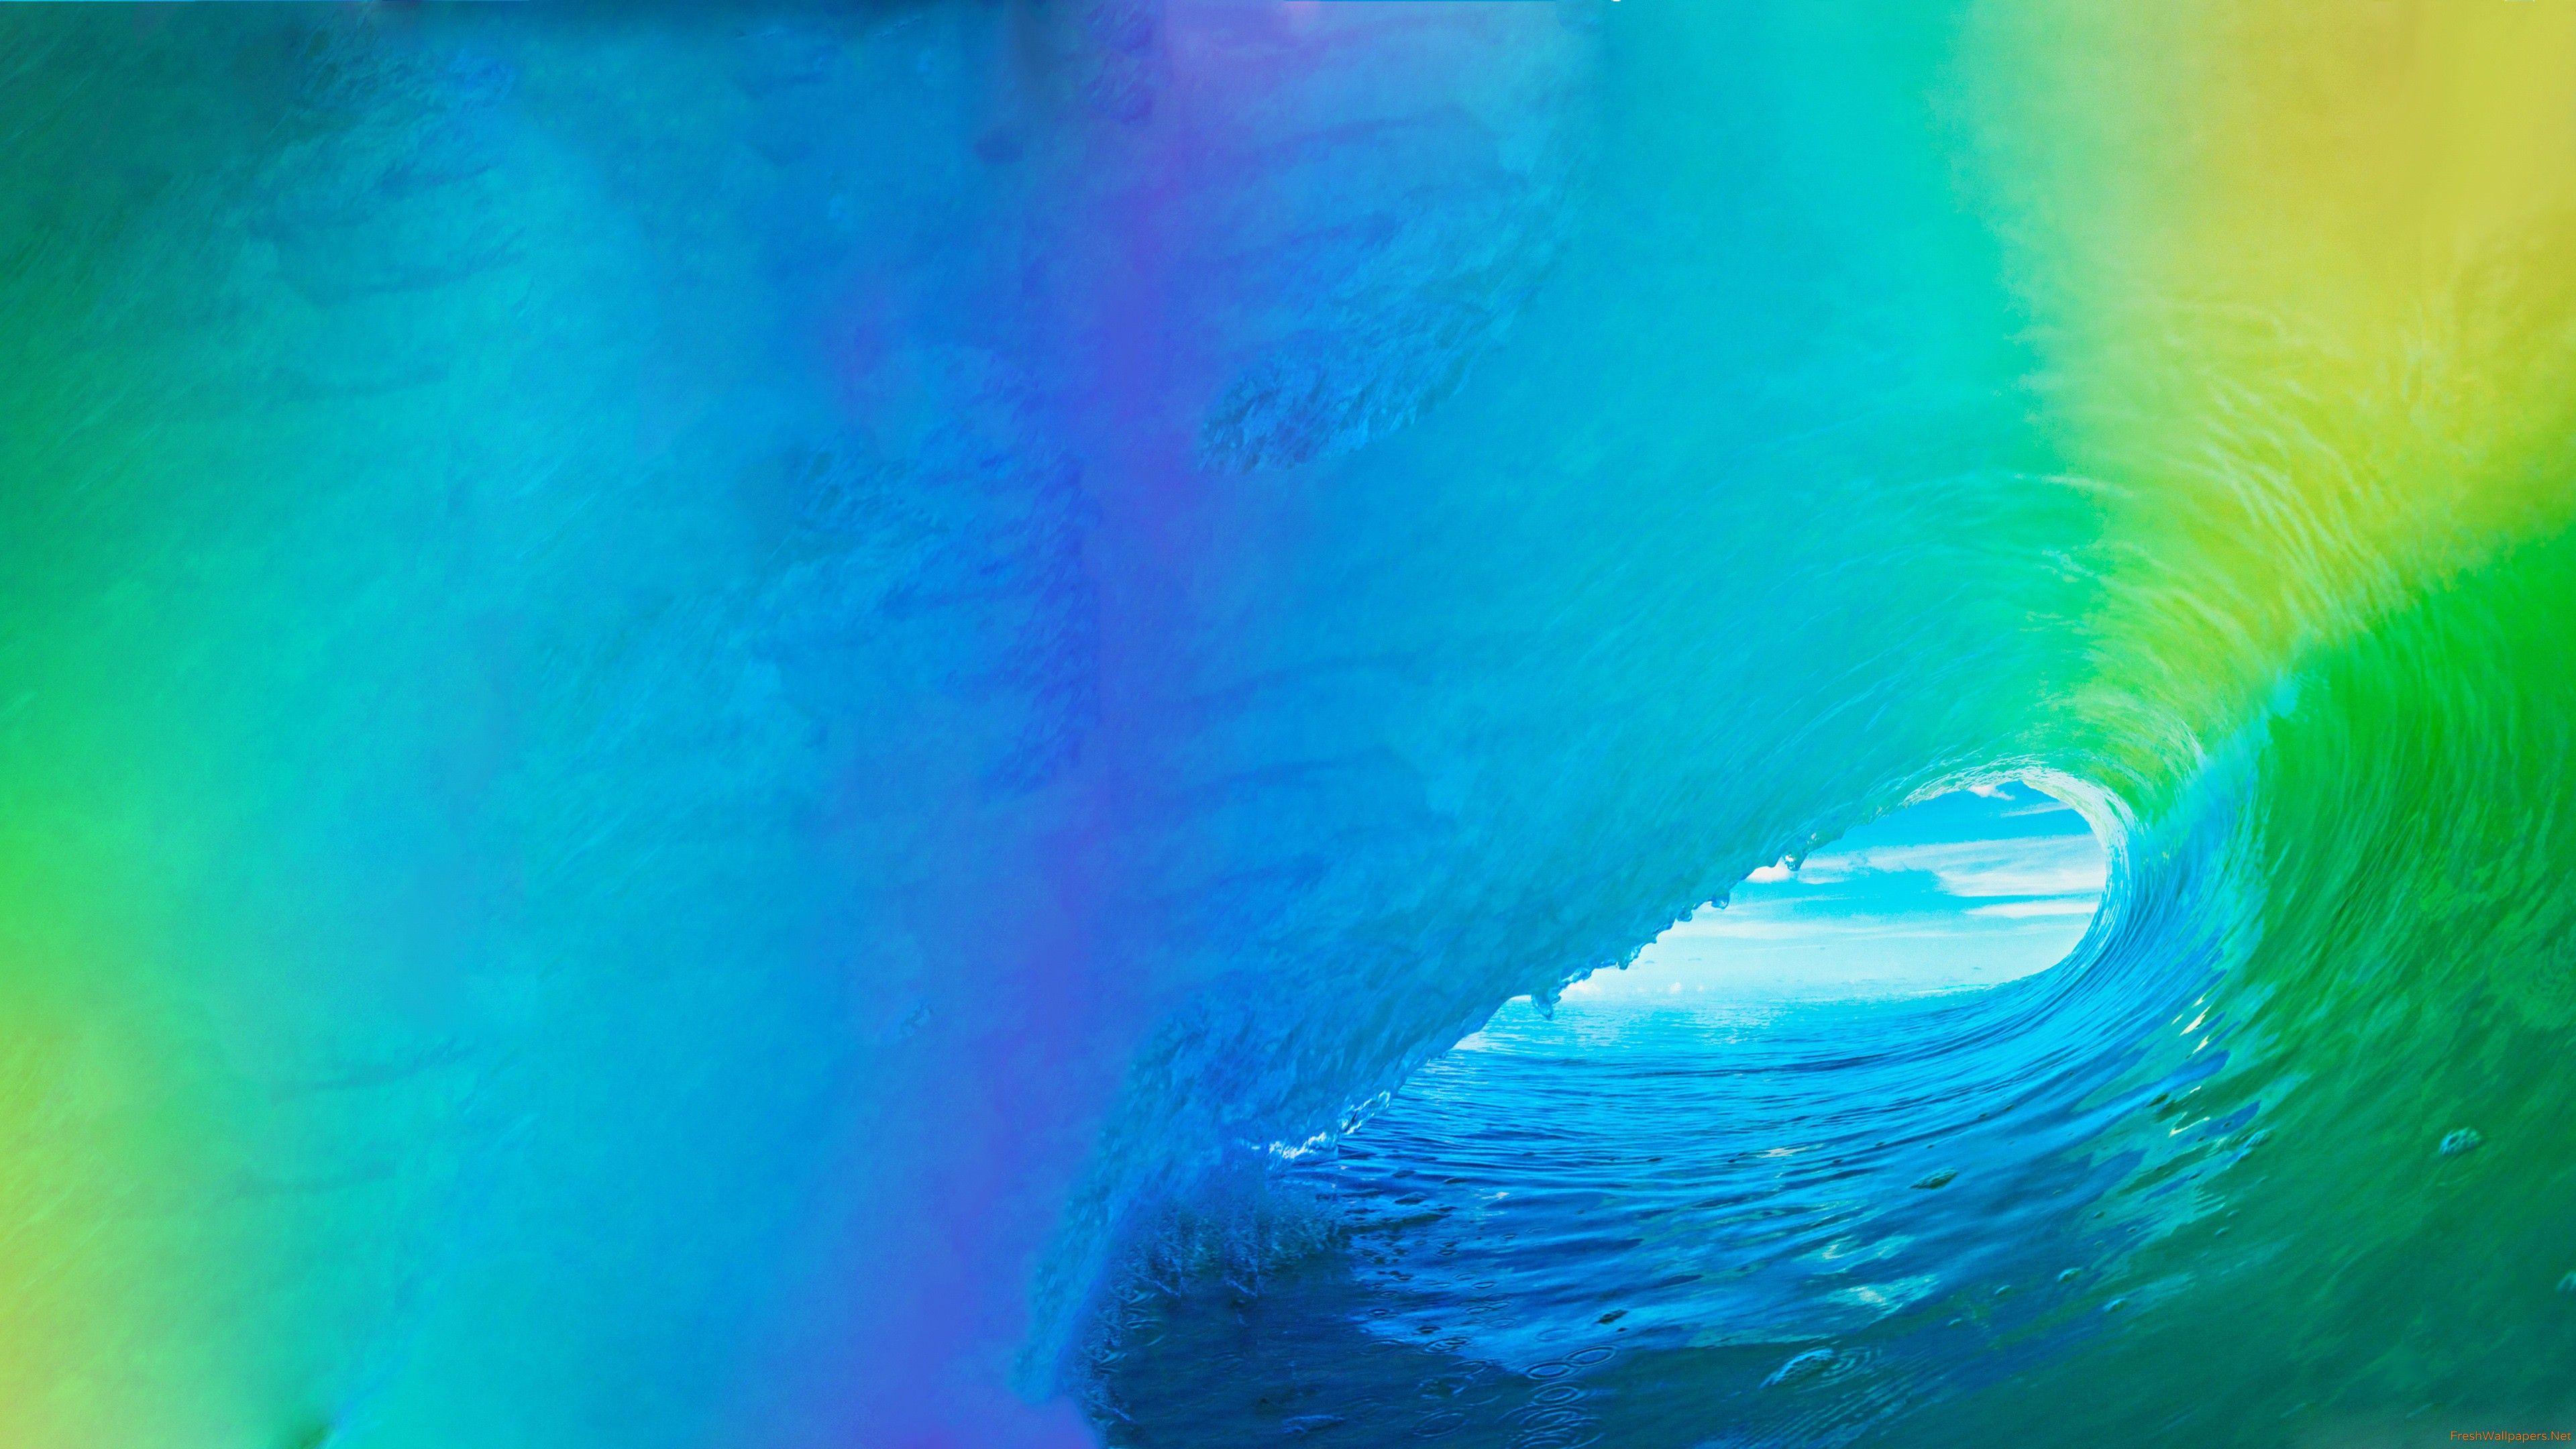 ,4K Ocean Wallpapers iPhone,Gold iPhone Wallpaper 4K,4K